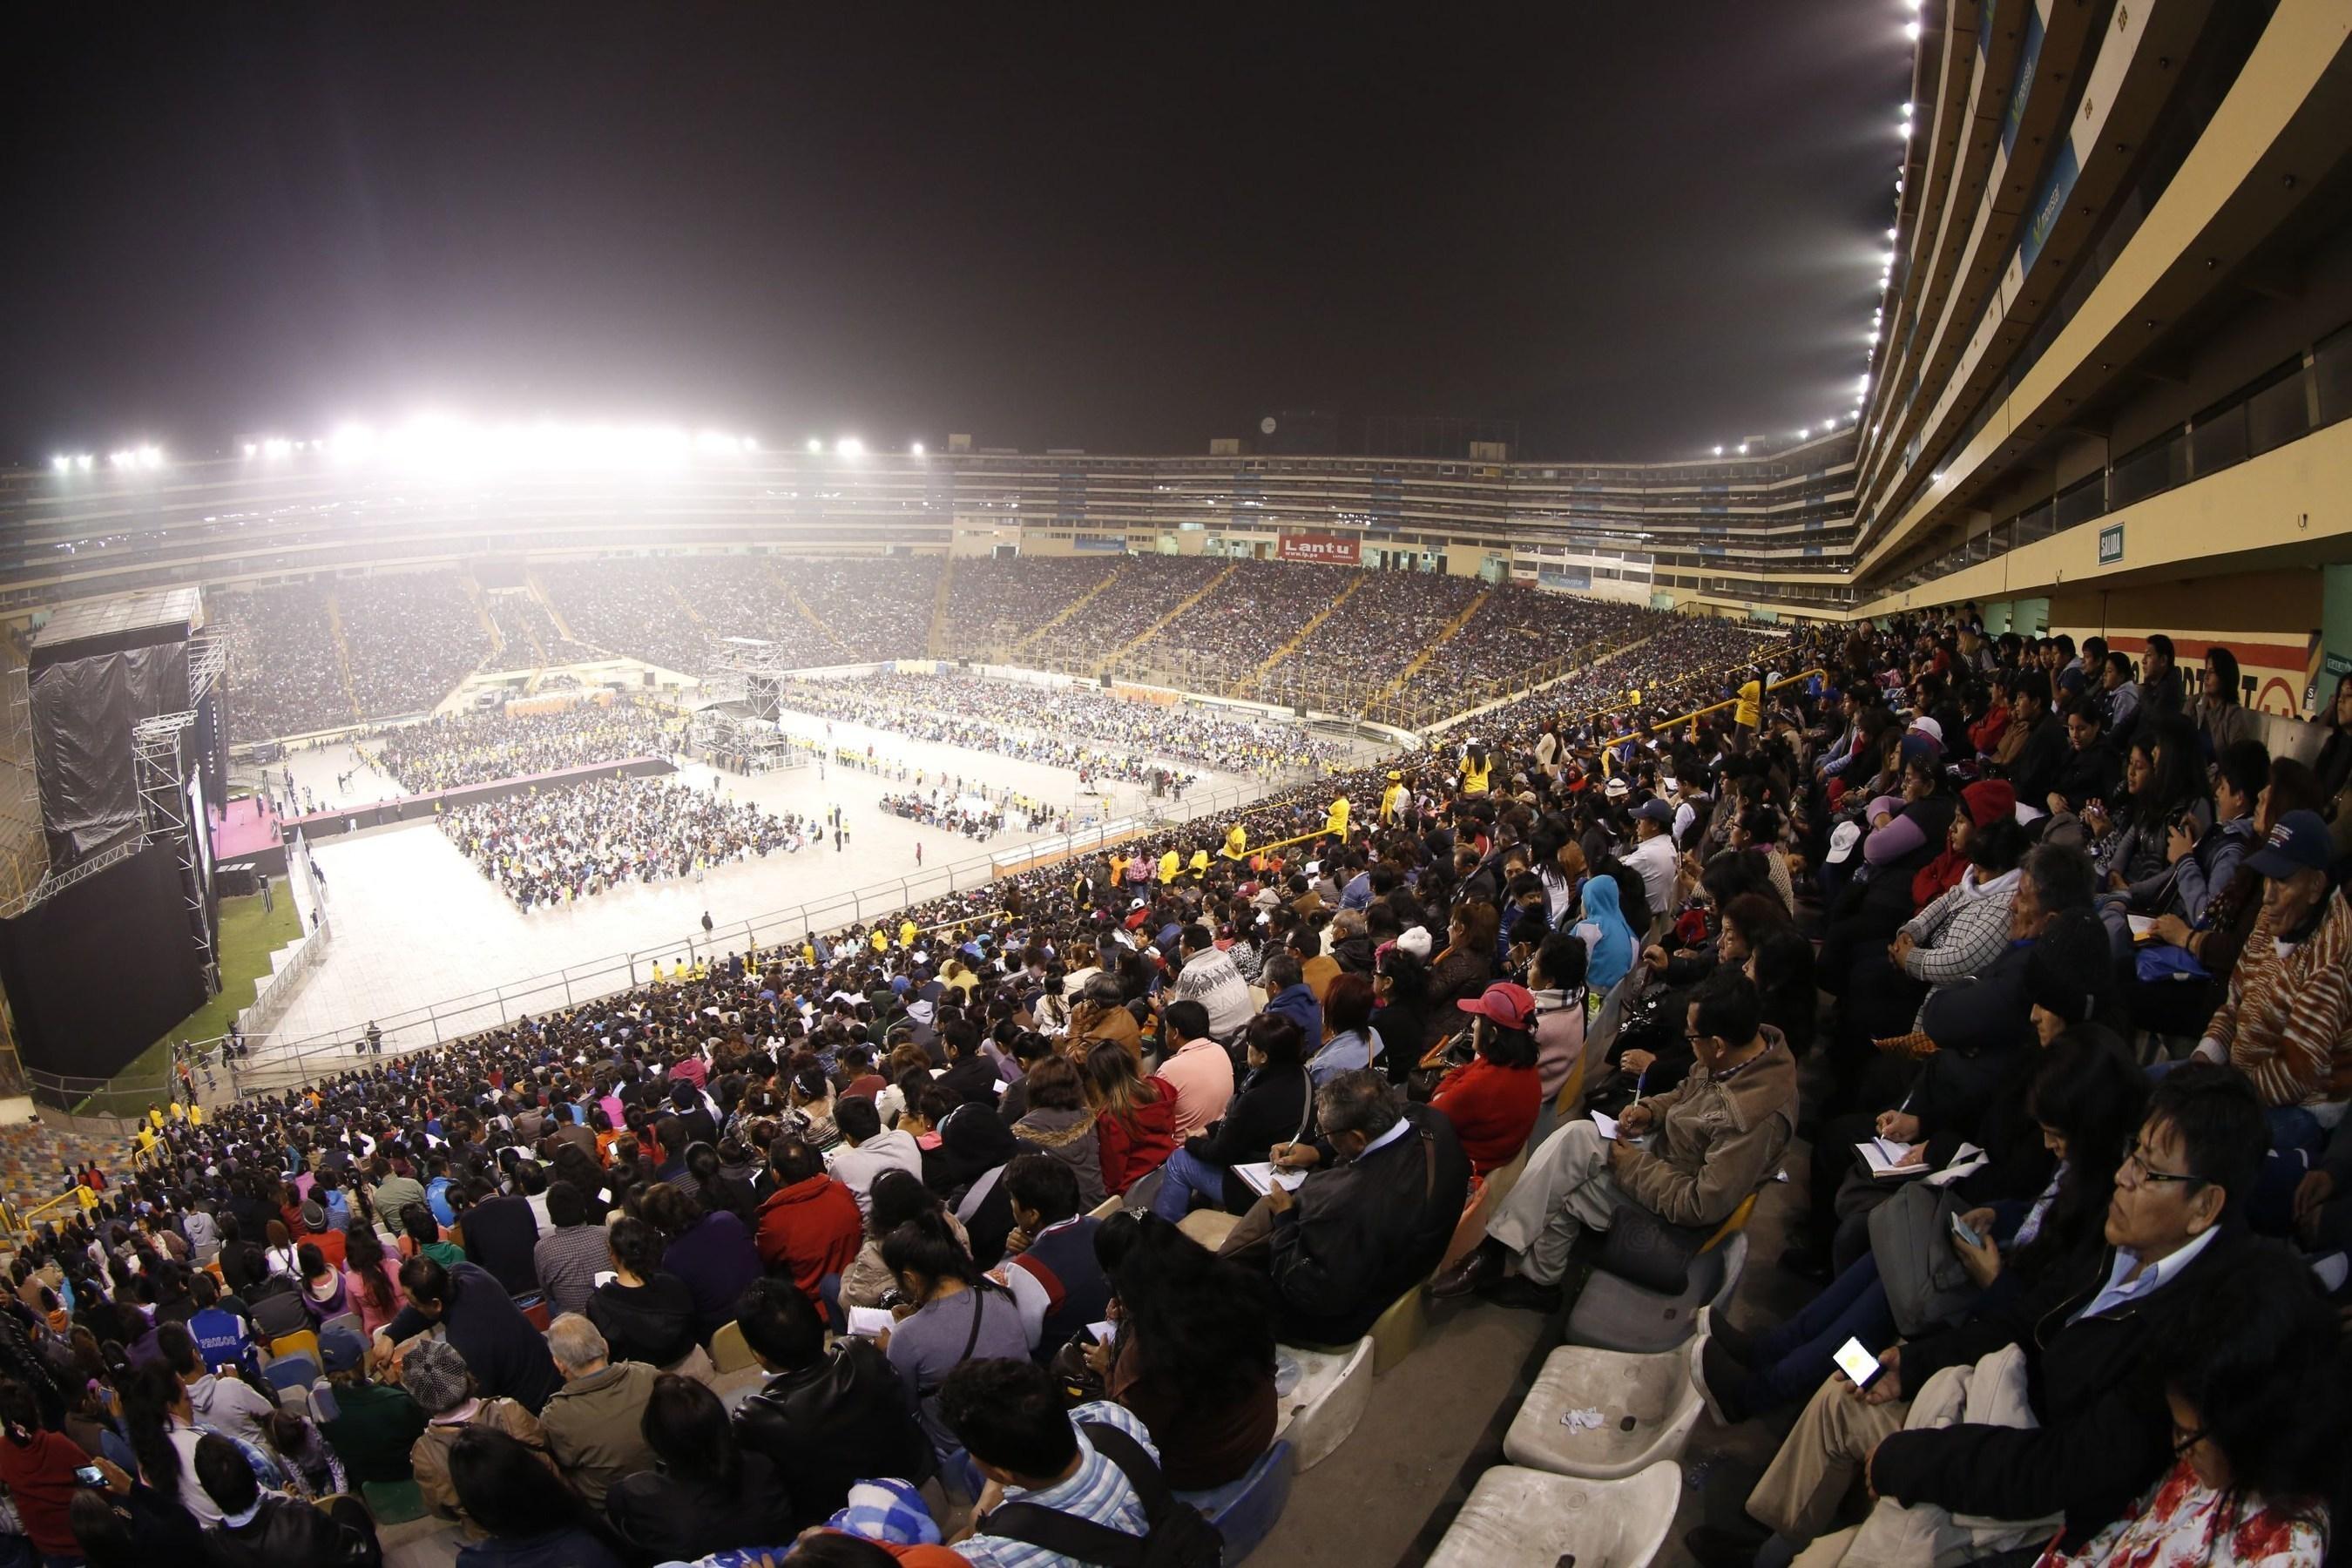 Lima's Estadio Monumental is filled to capacity during T.B. Joshua's crusade. (PRNewsFoto/Emmanuel TV)